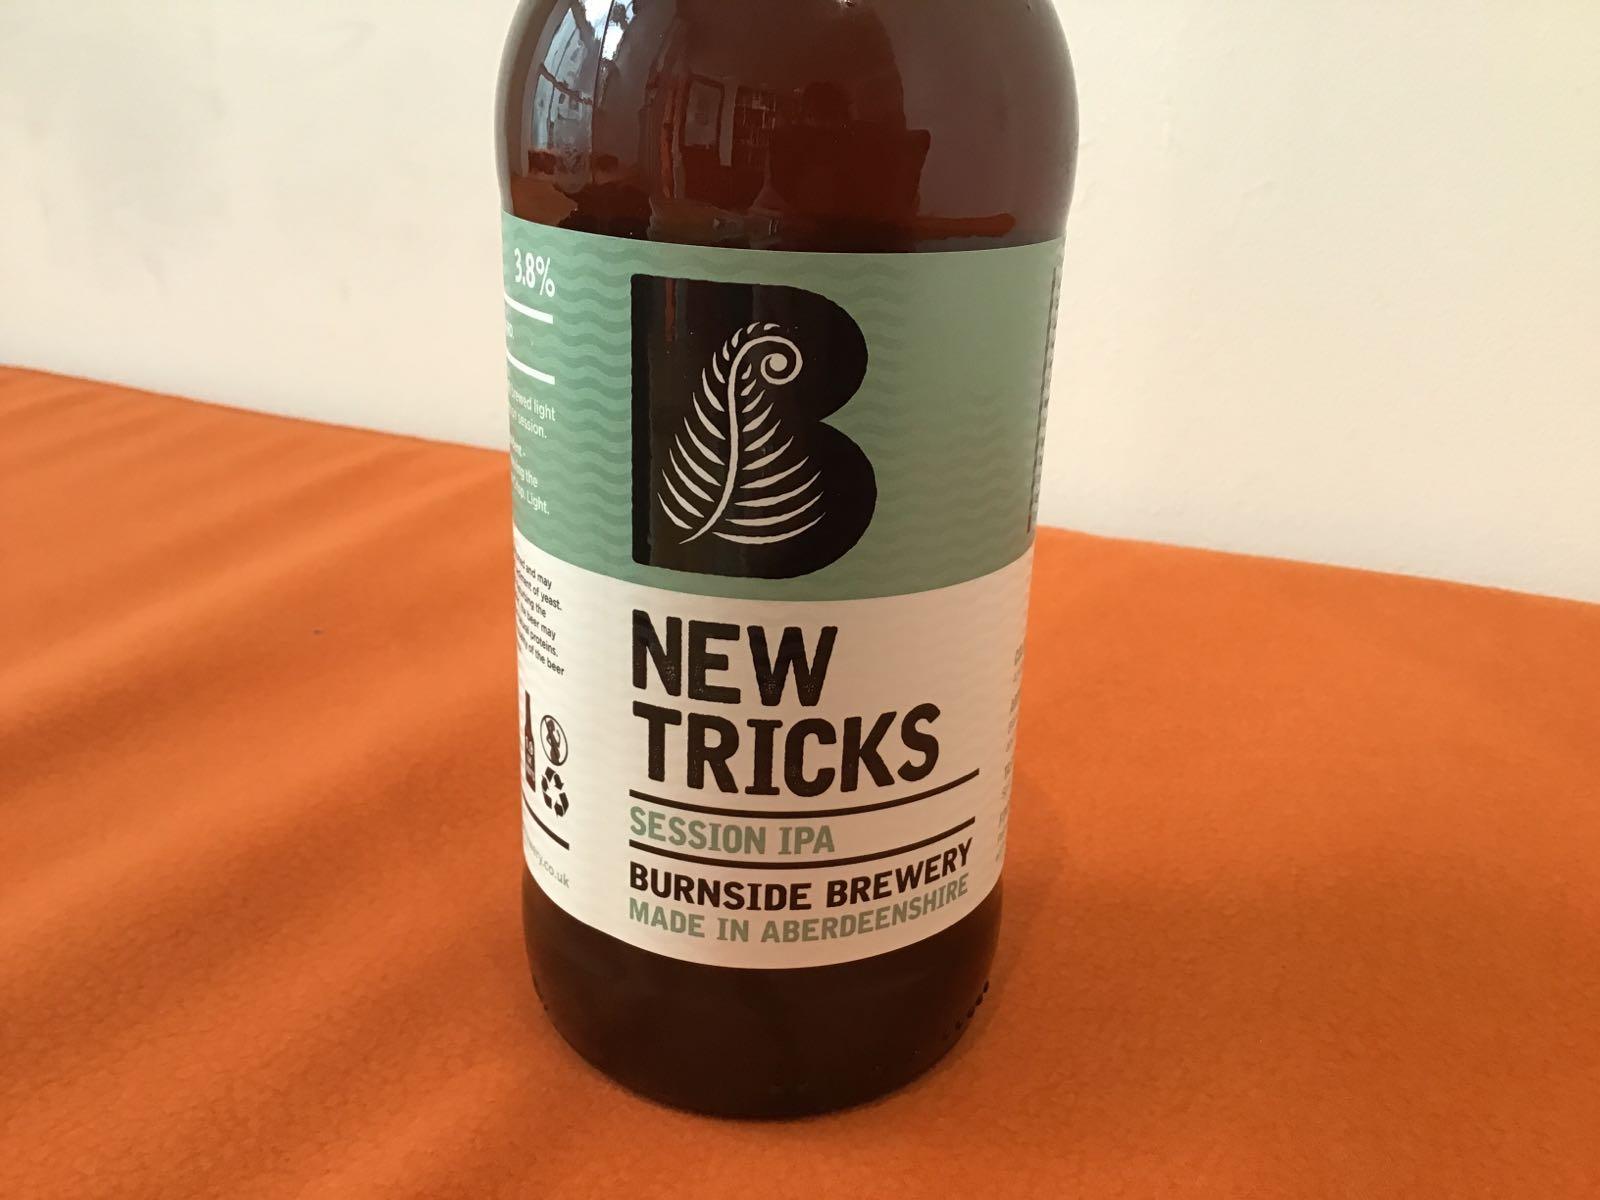 Burnside Brewery:  New Tricks